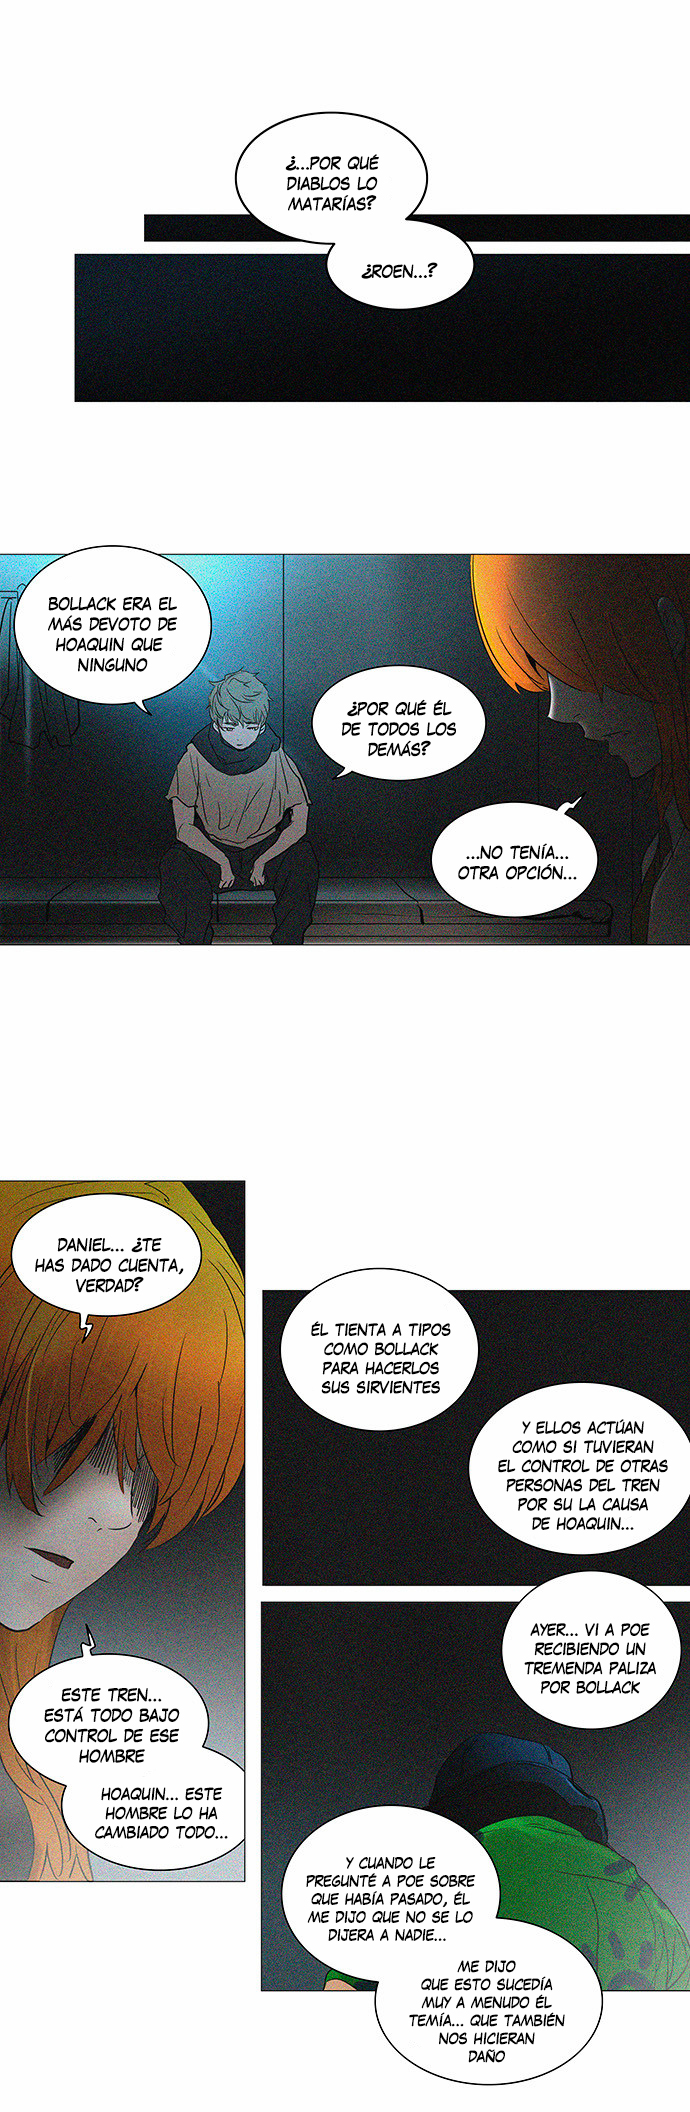 http://c5.ninemanga.com/es_manga/21/149/394013/3c11b06a39962827e21ddff5932f5262.jpg Page 4